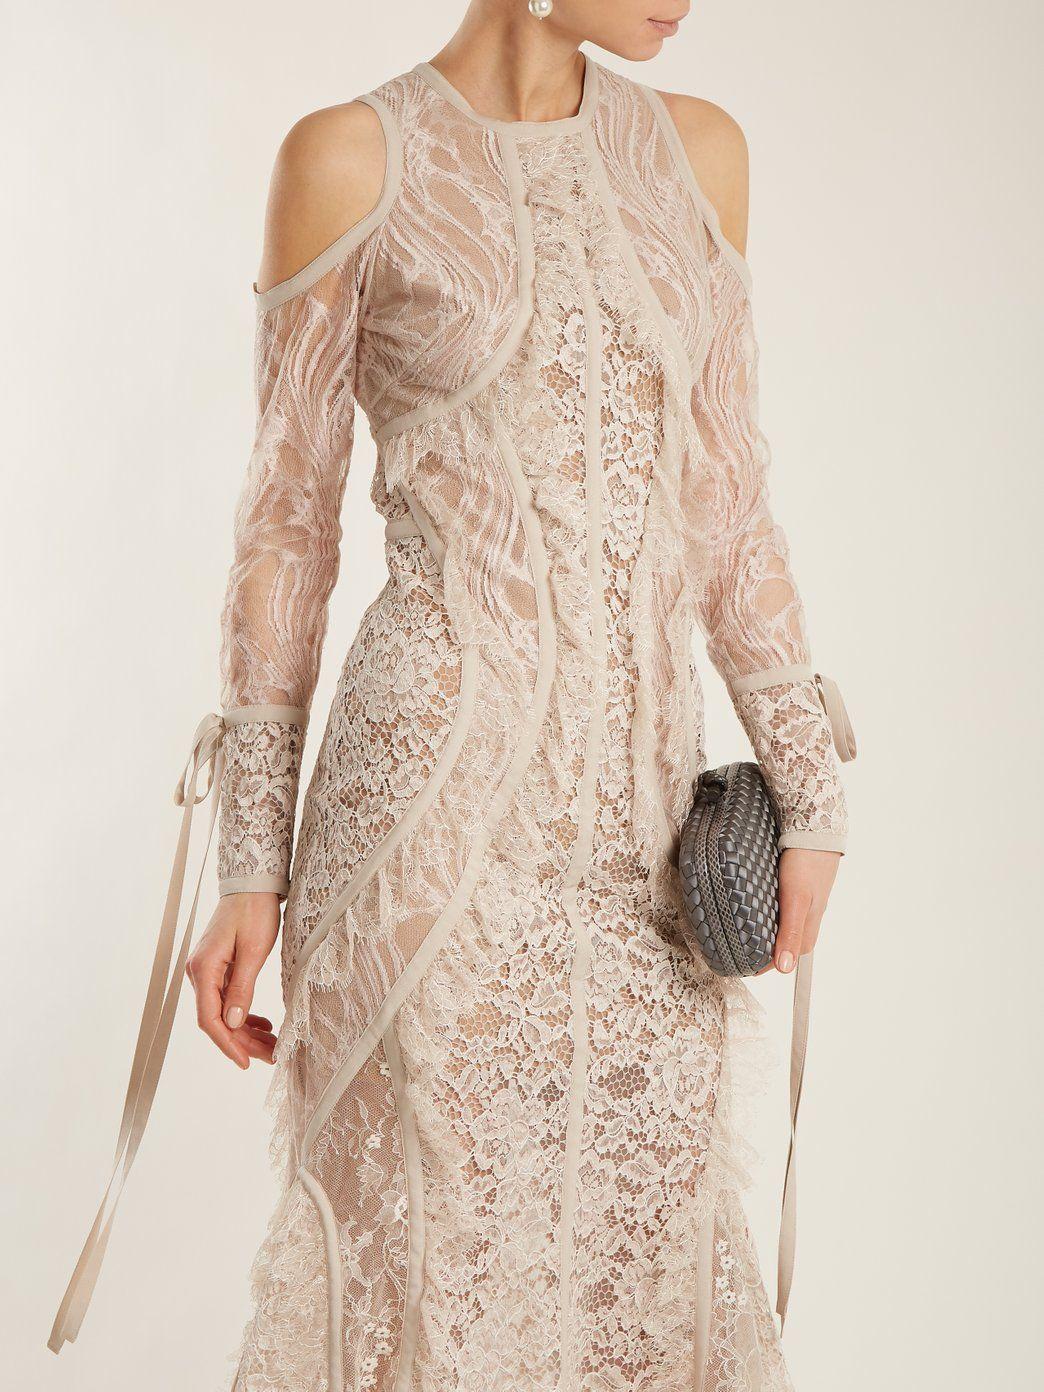 Buy Cheap Excellent Fluted-hem floral-lace dress Elie Saab Perfect Online 3745i6NQnT